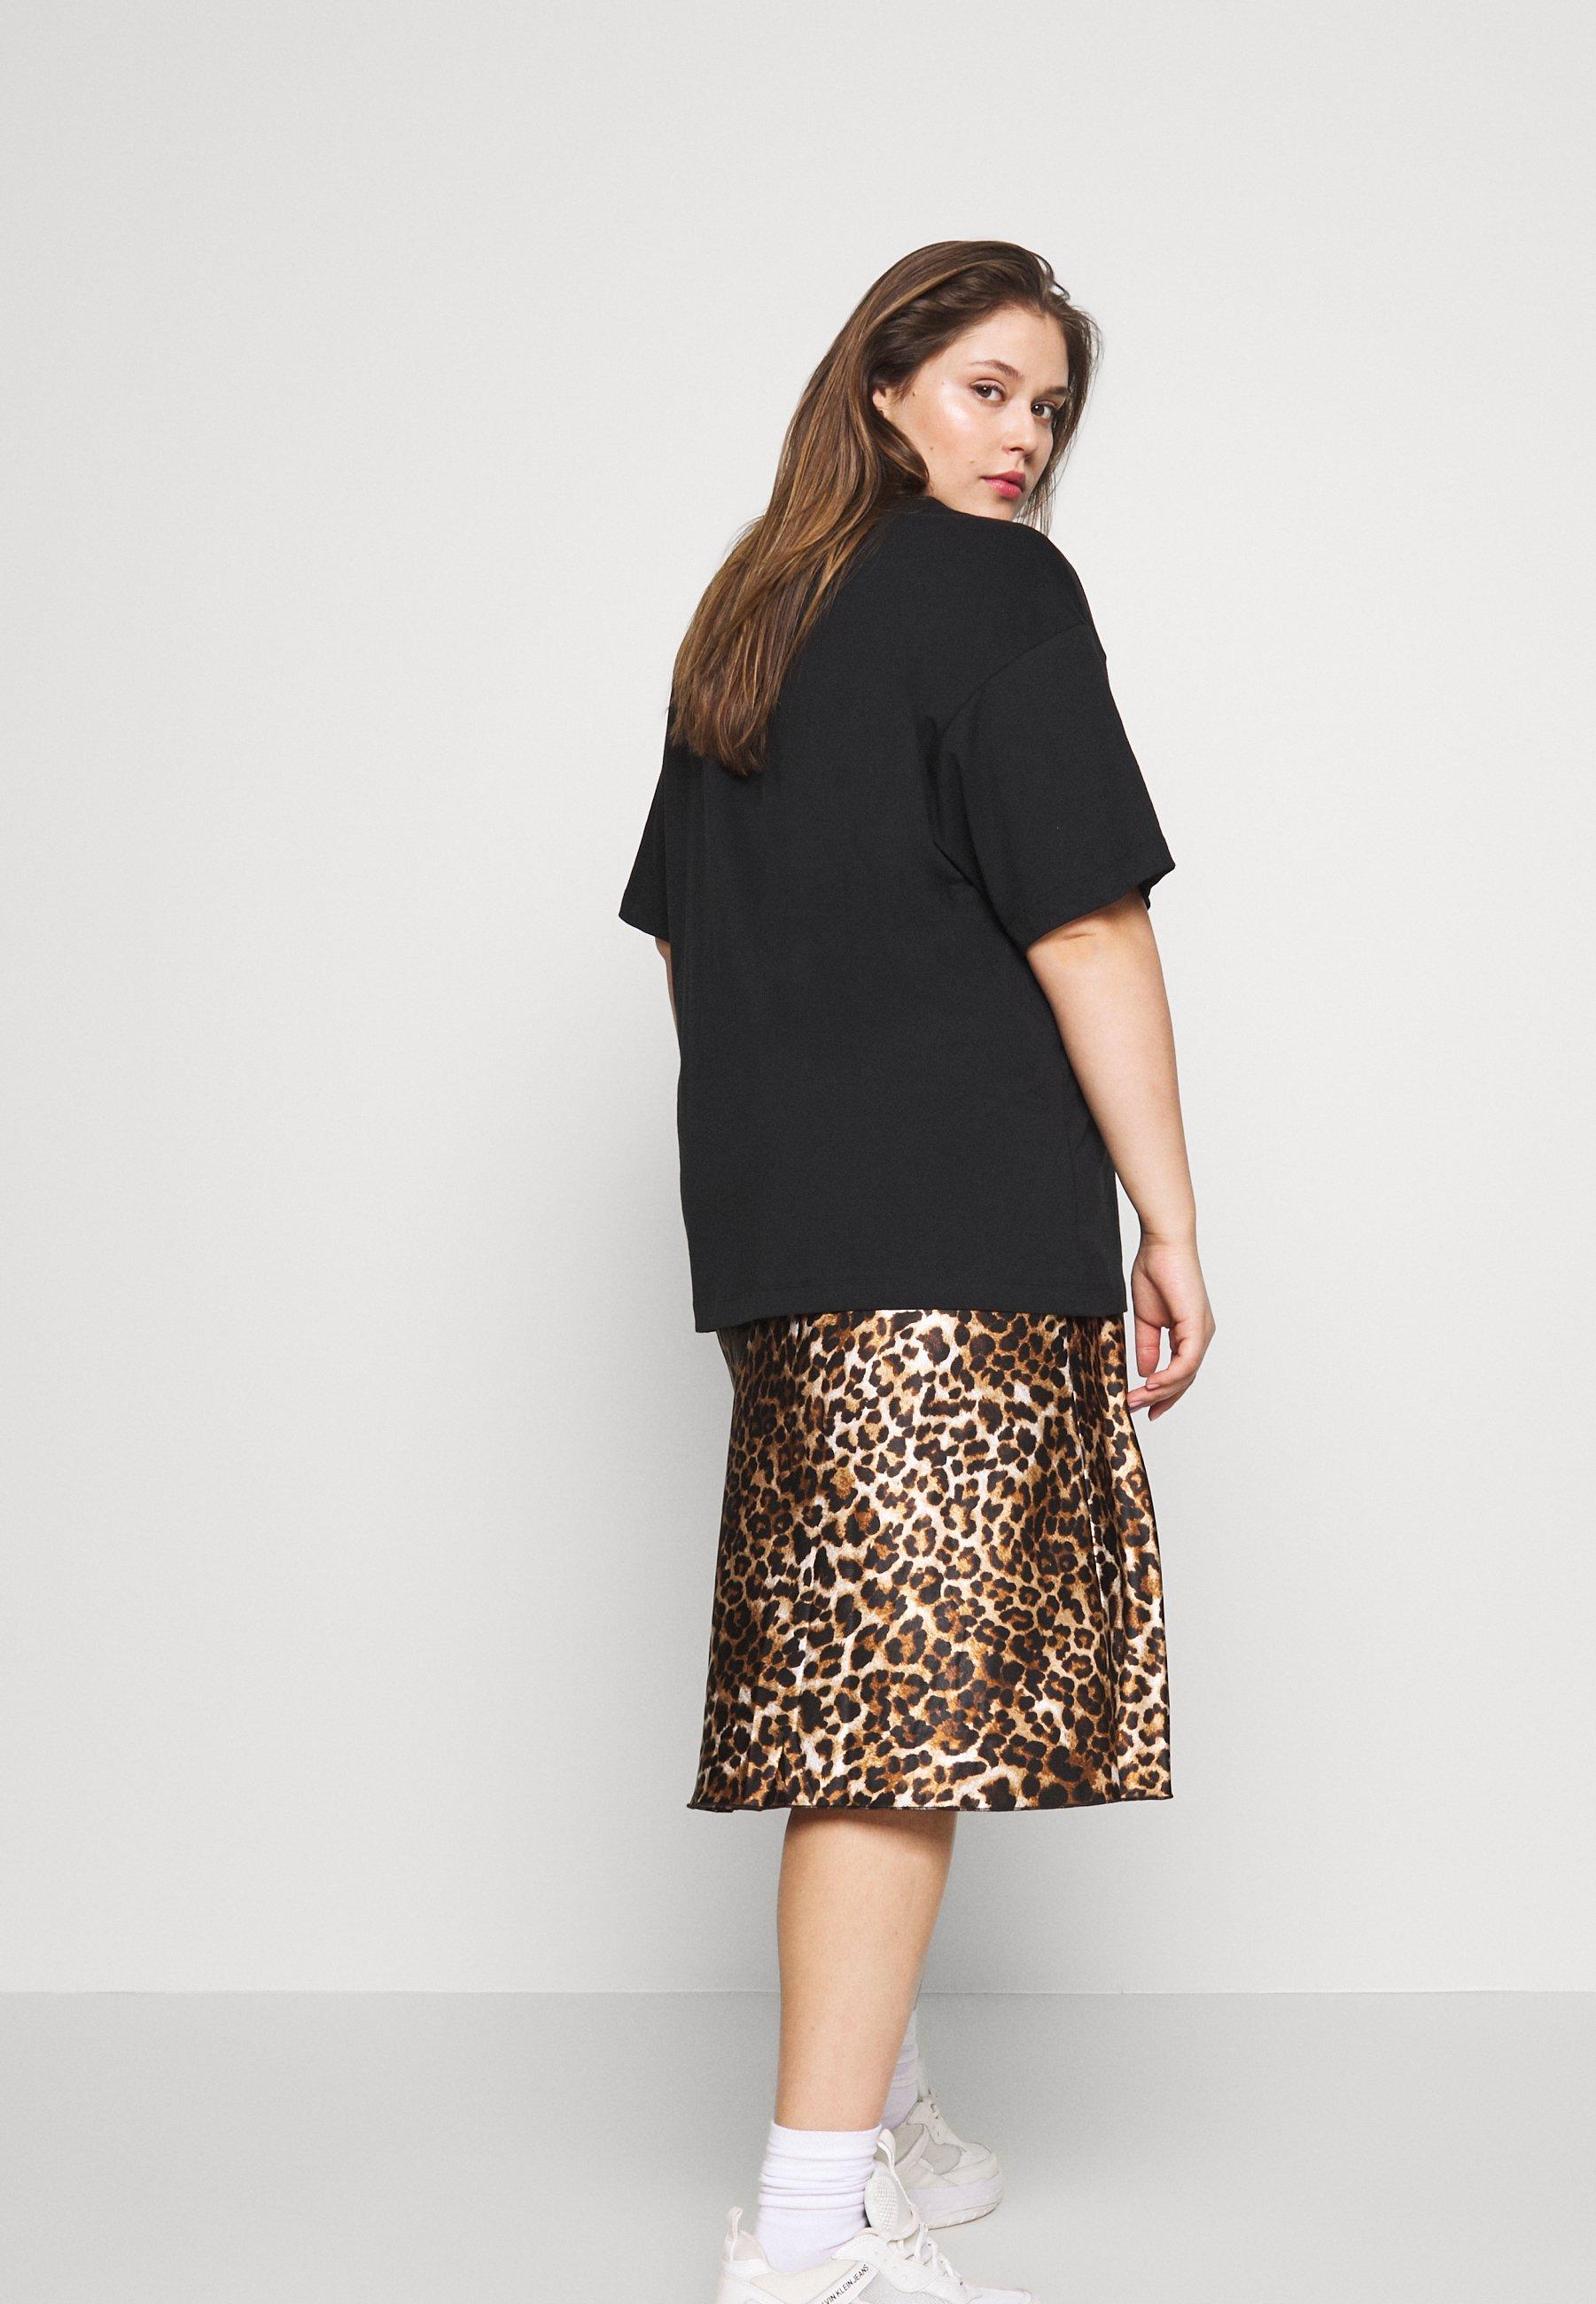 Nike Sportswear T-shirts - Black/white/svart